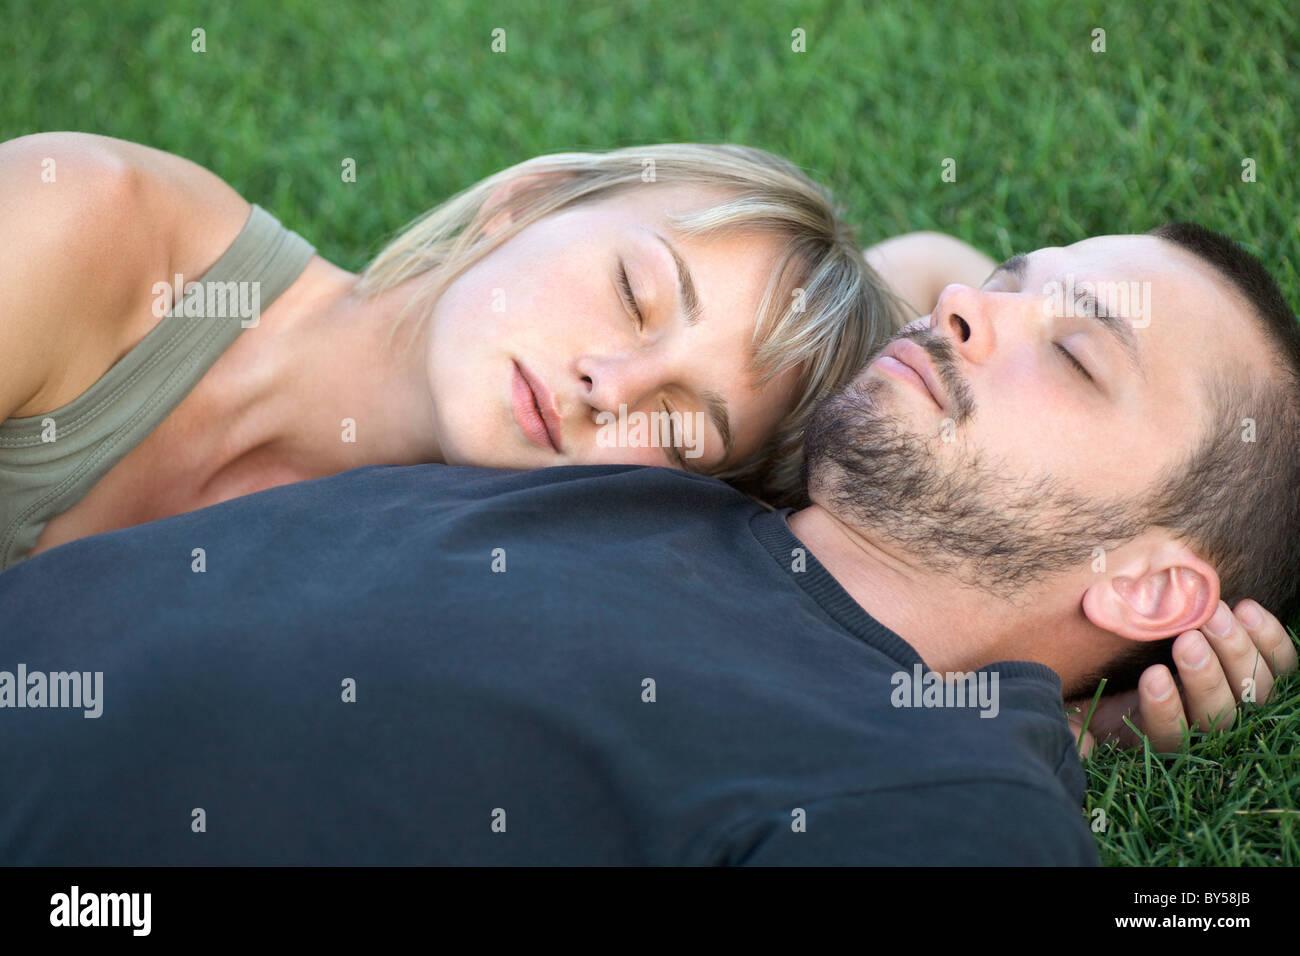 Man and woman sleeping on grass - Stock Image